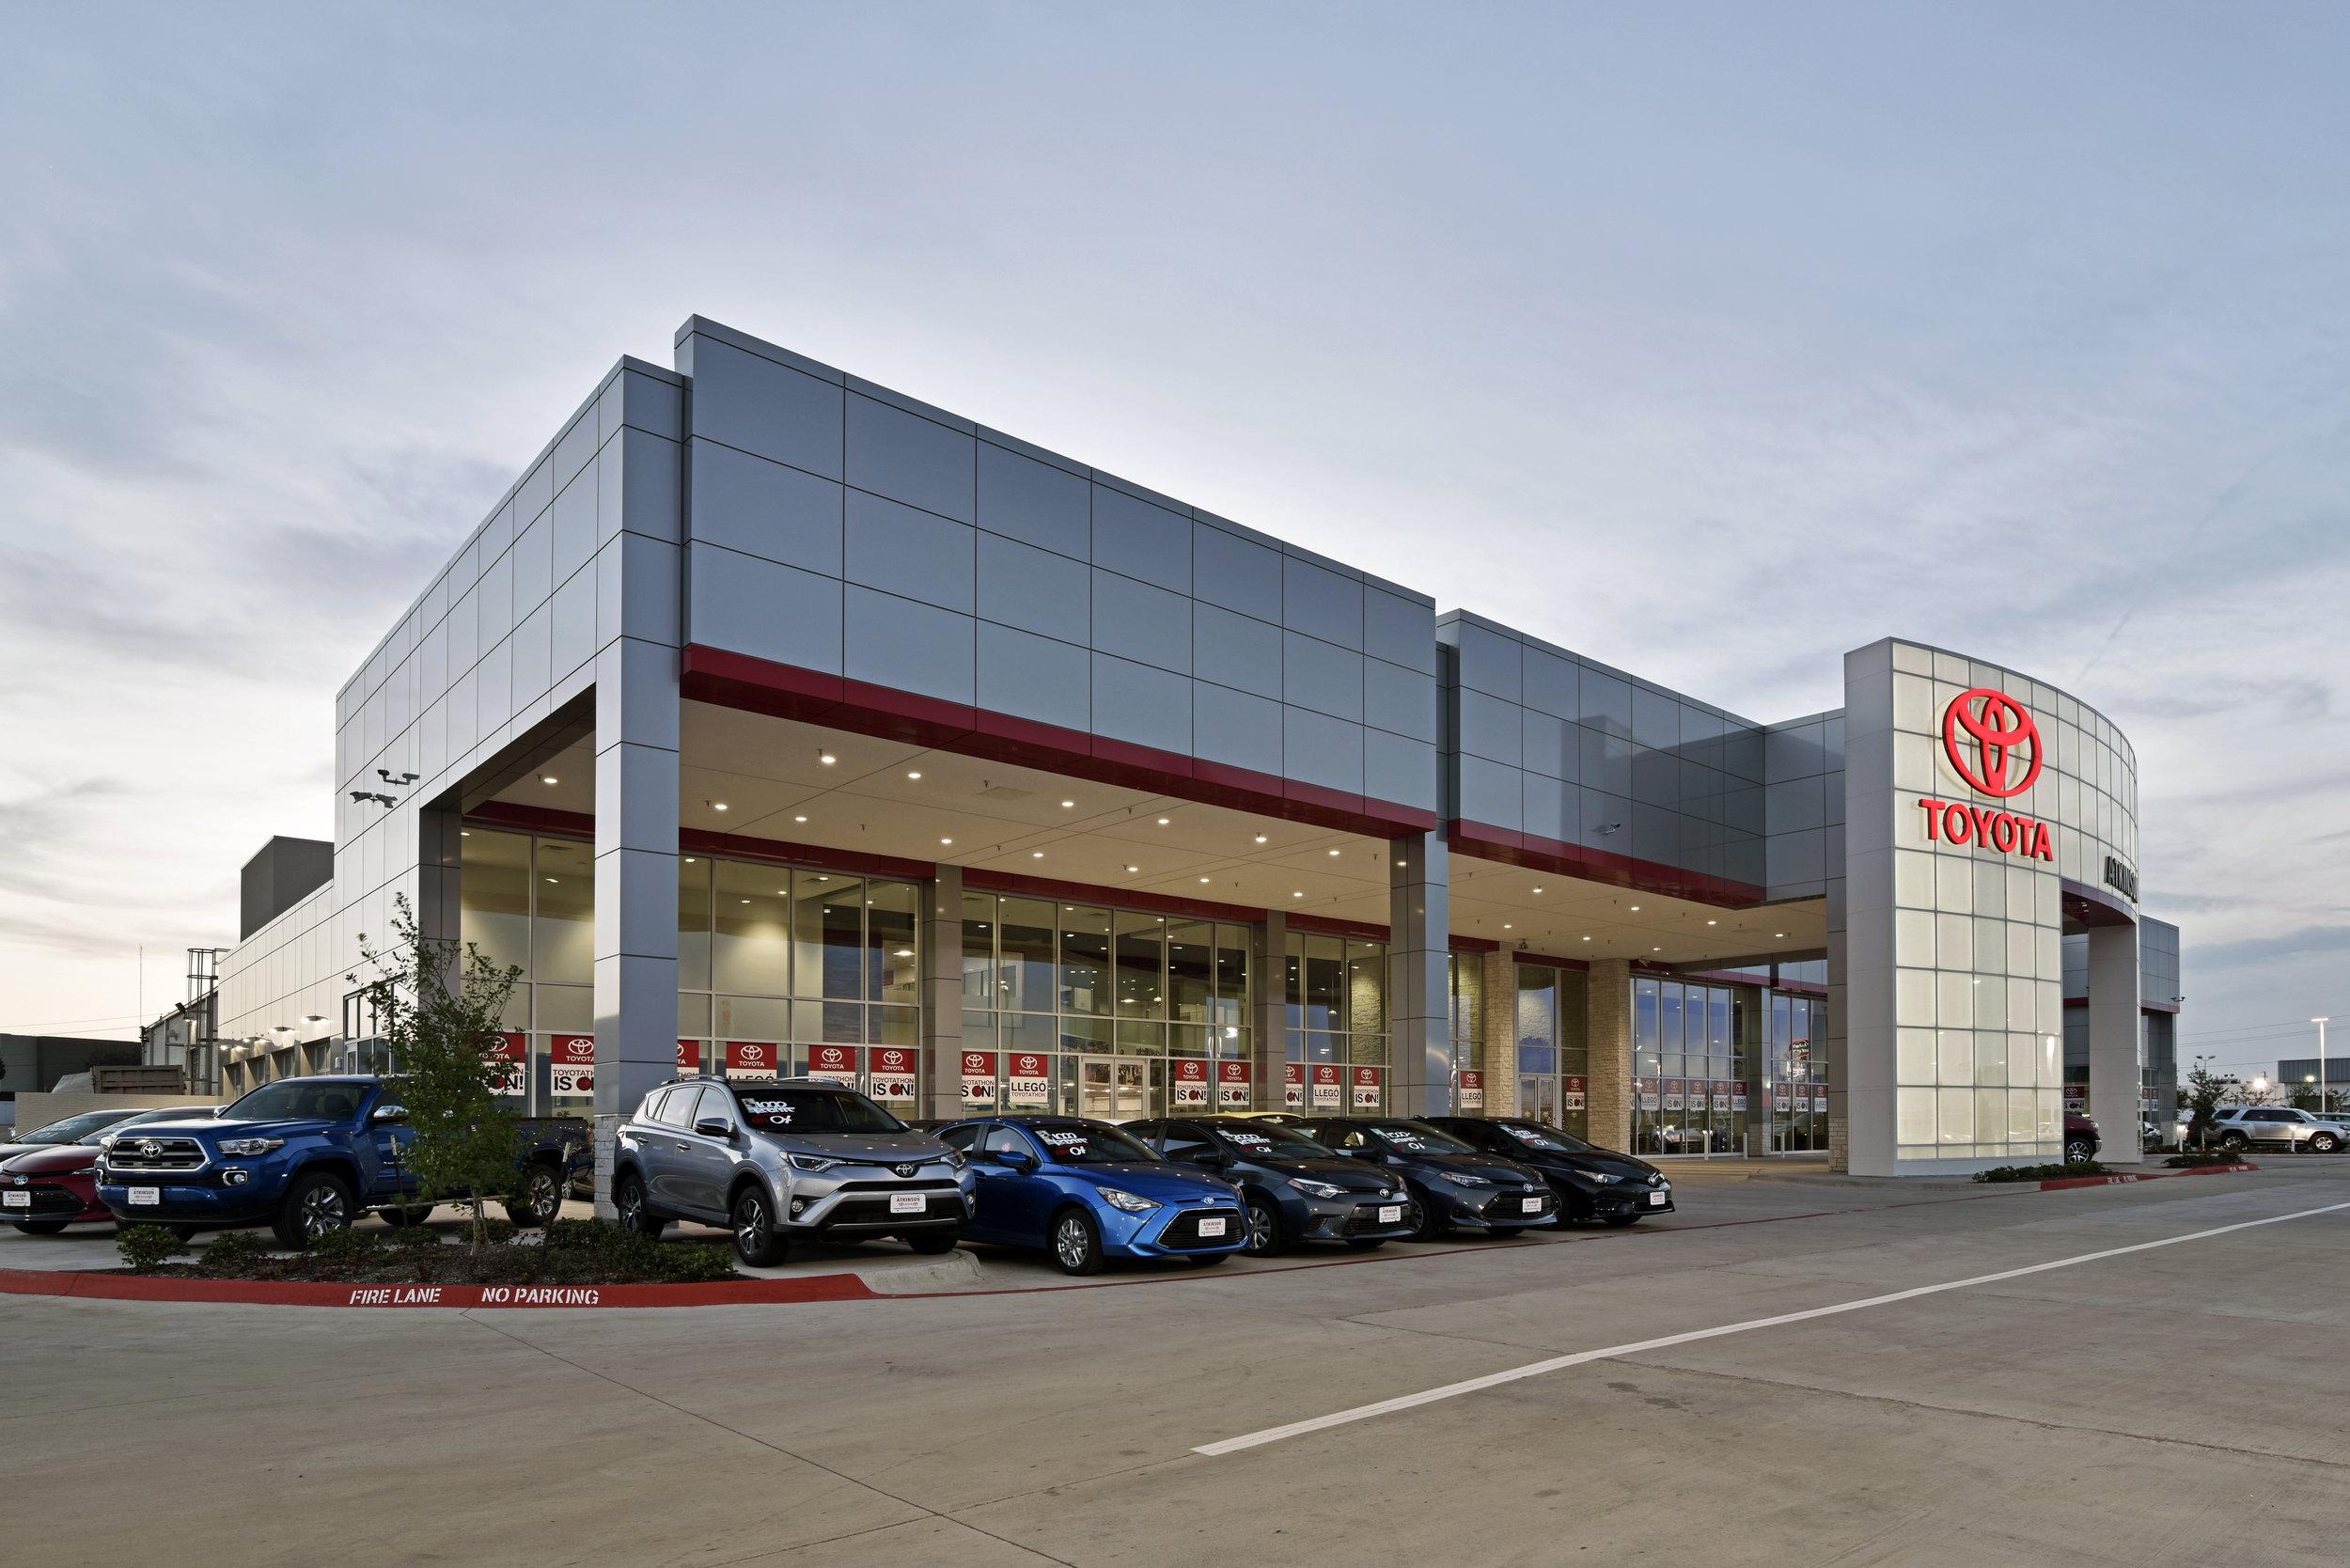 Atkinson Toyota, Dallas, TX